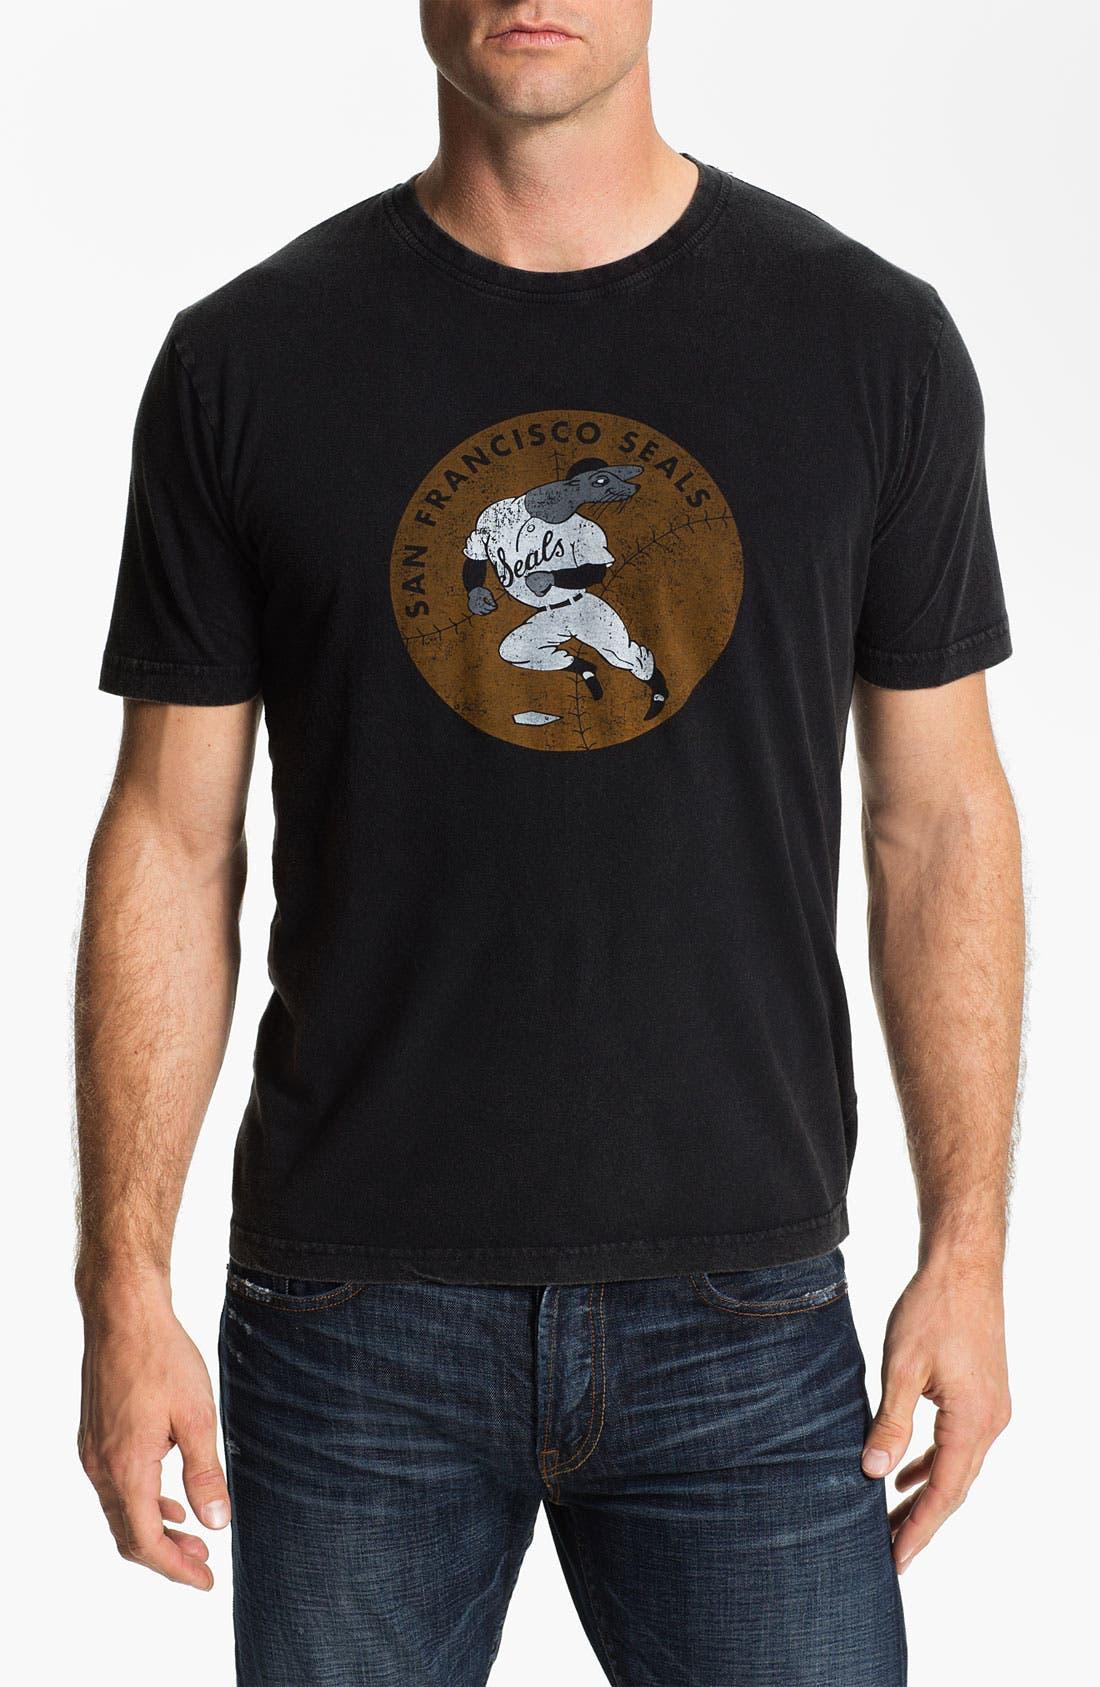 Alternate Image 1 Selected - Red Jacket 'San Francisco Seals - Brass Tack' T-Shirt